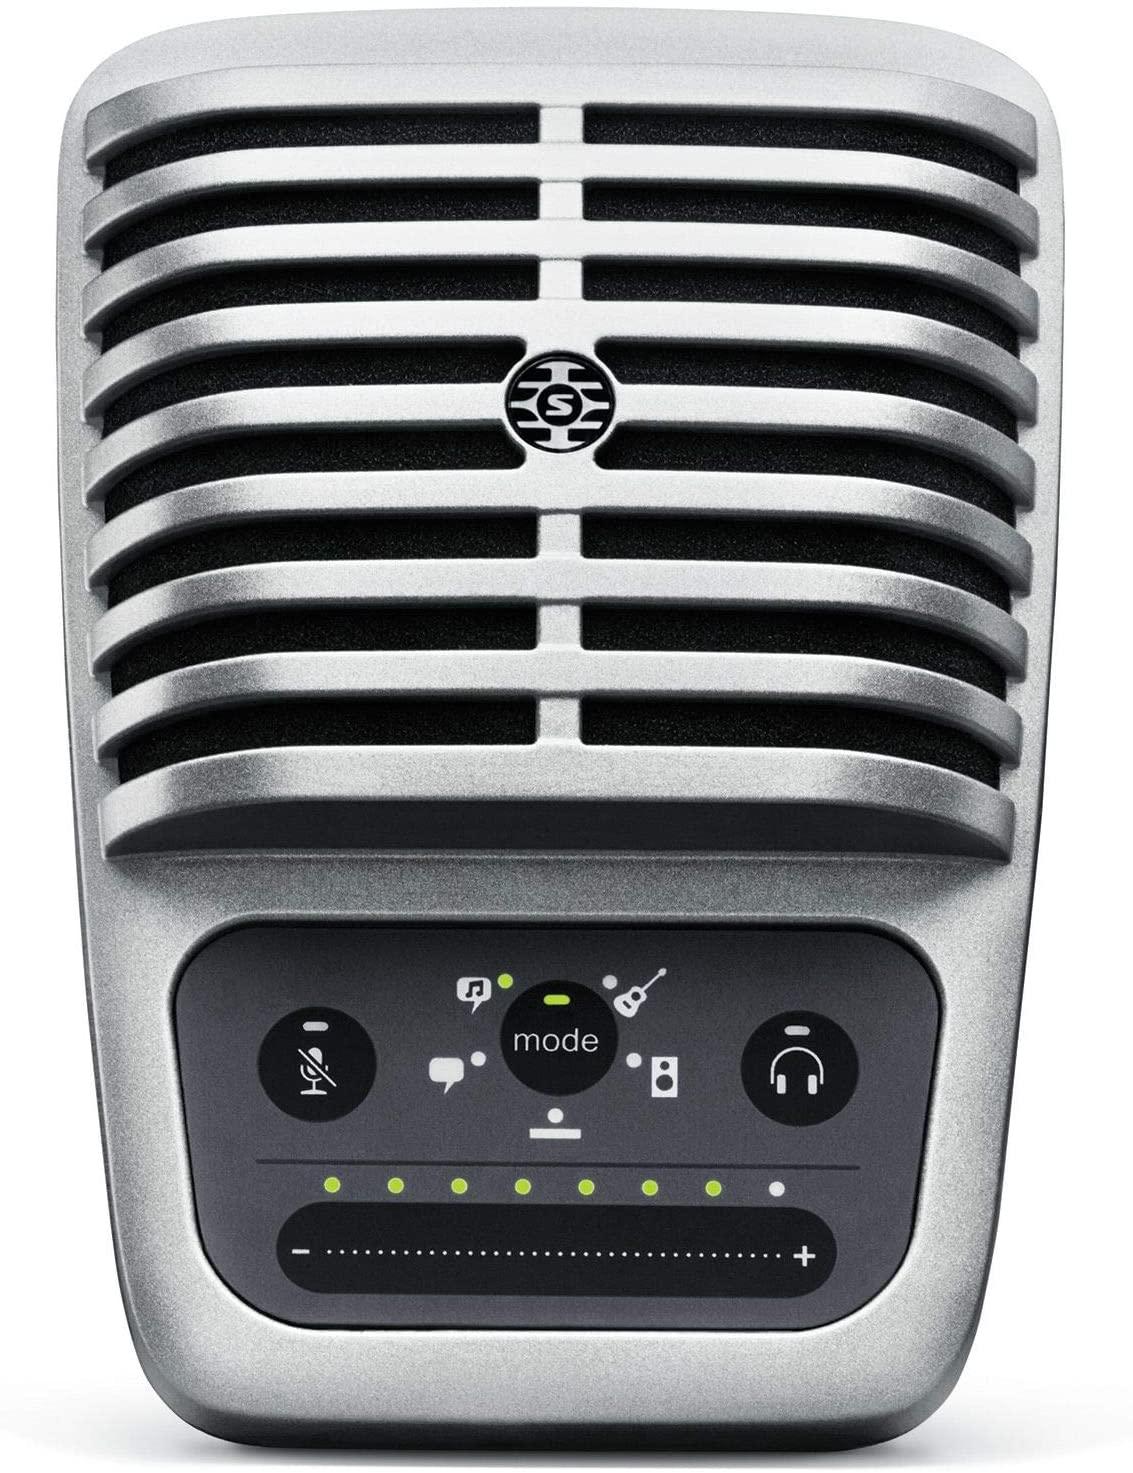 Gen 1 & 2 Shure MV51 Digital Large-Diaphragm Condenser Microphone + USB, Lightning & USB-C Cable: $149